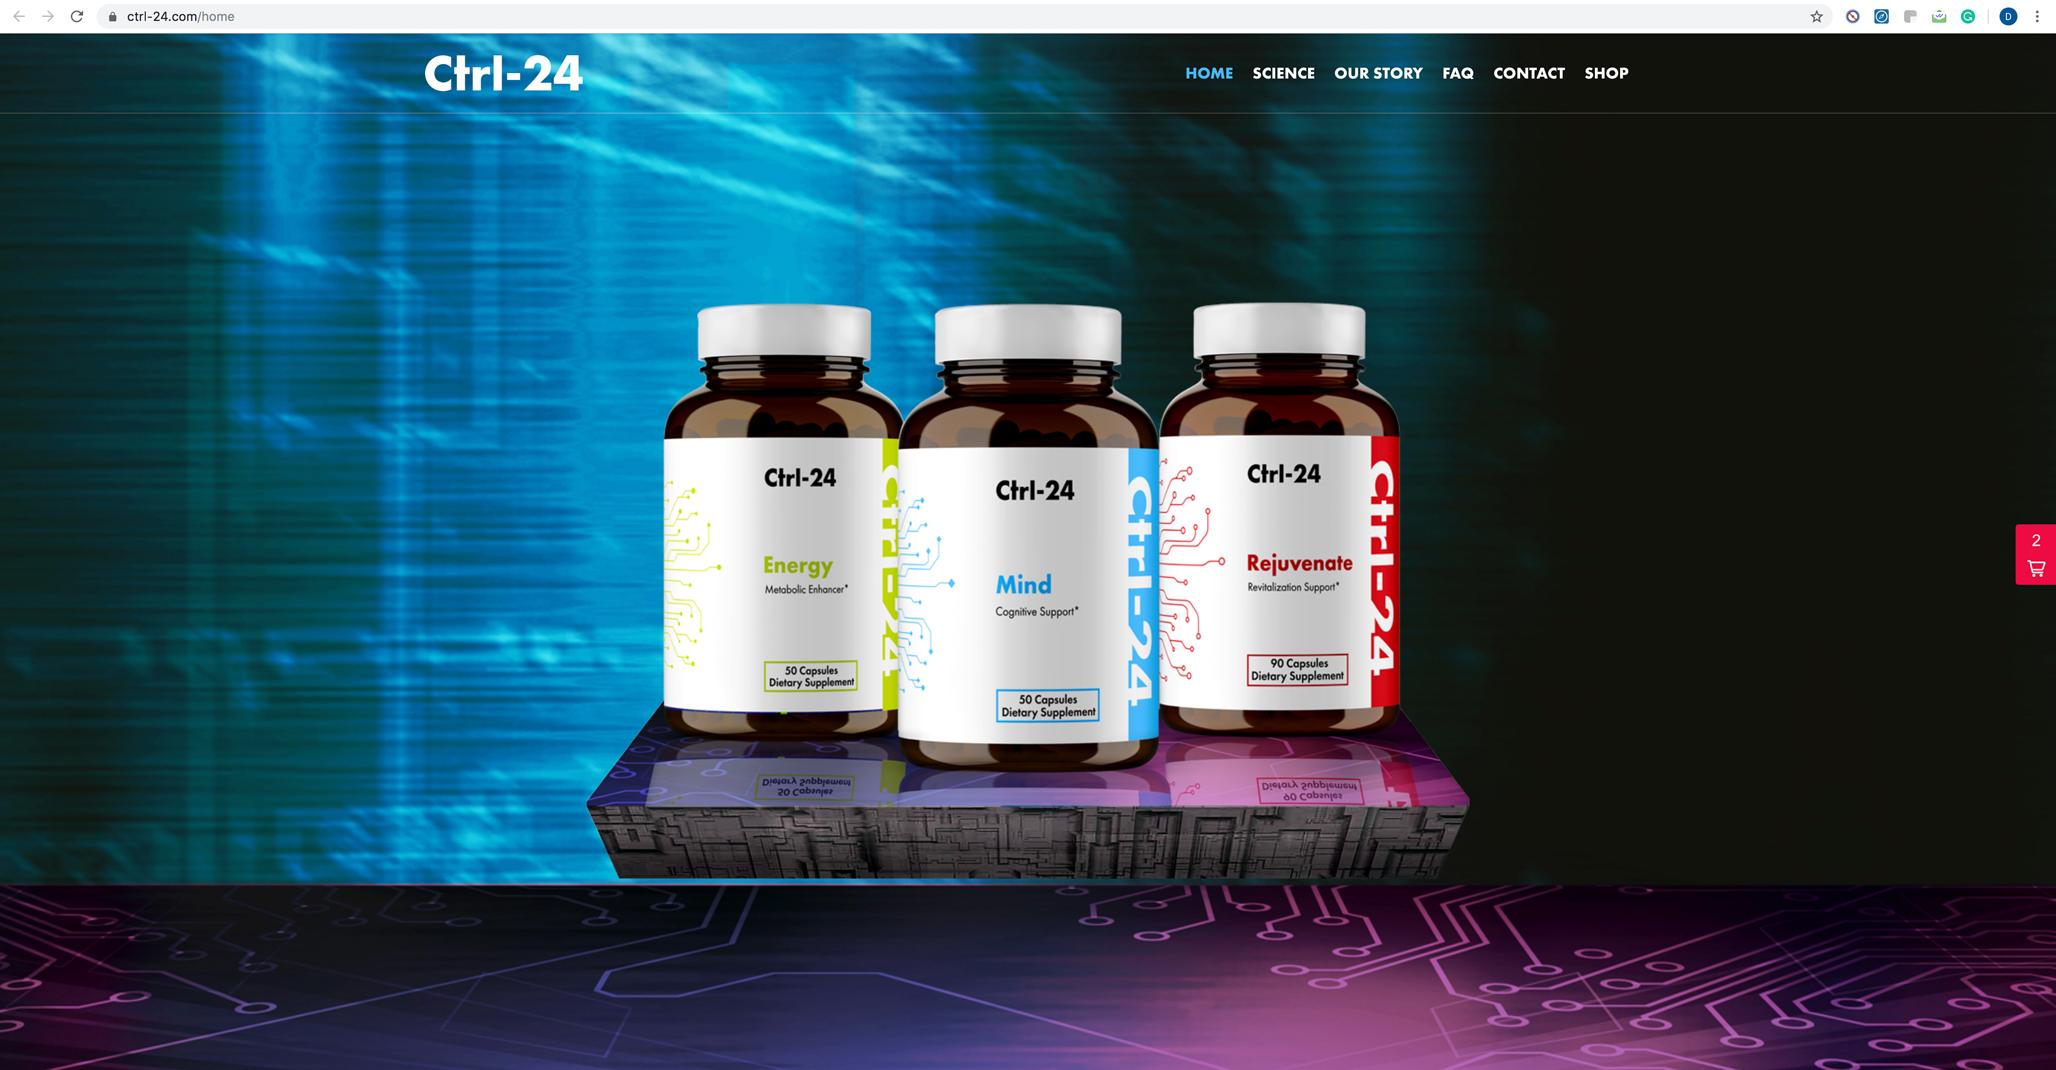 Ctrl-24-website Trash Studios.jpg